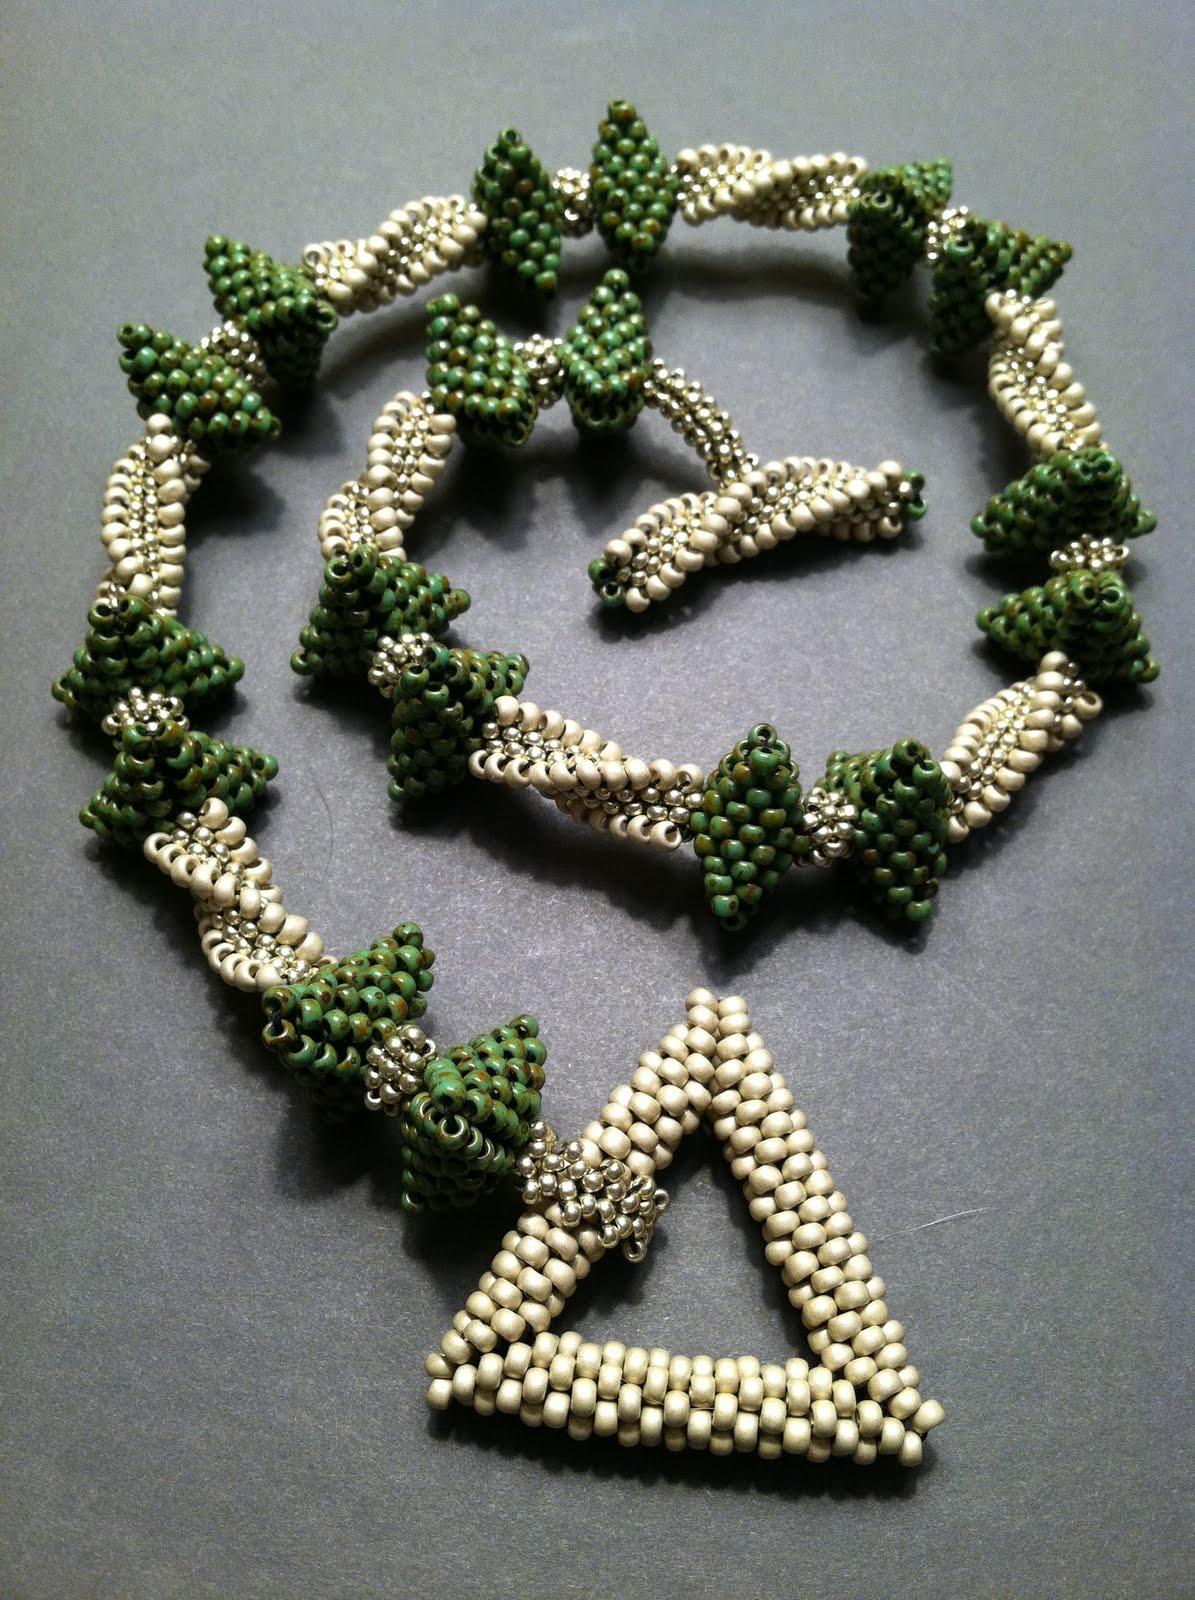 Beth Stone Beaded Jewelry Designs